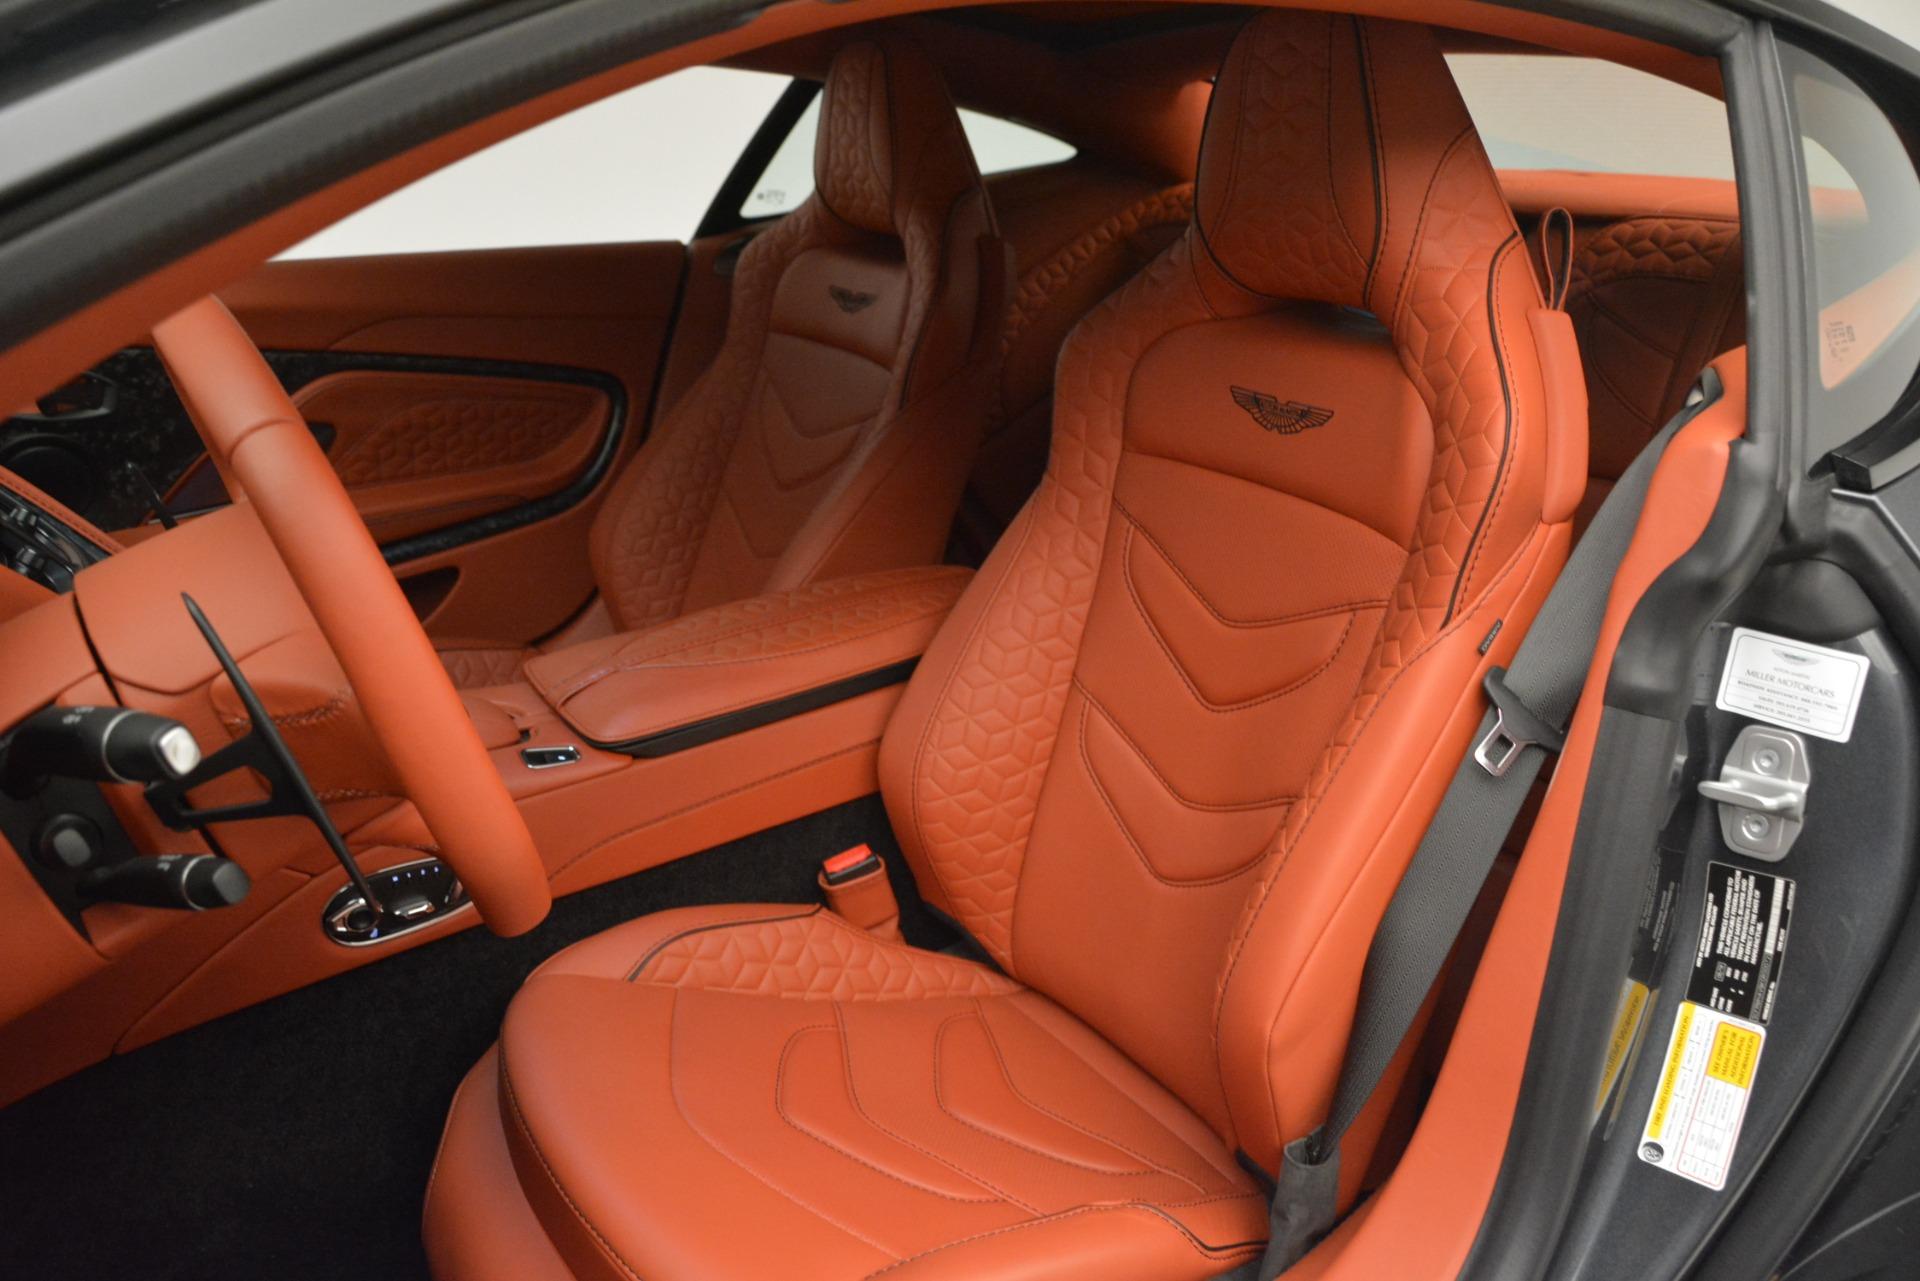 New 2019 Aston Martin DBS Superleggera For Sale In Greenwich, CT 2827_p21